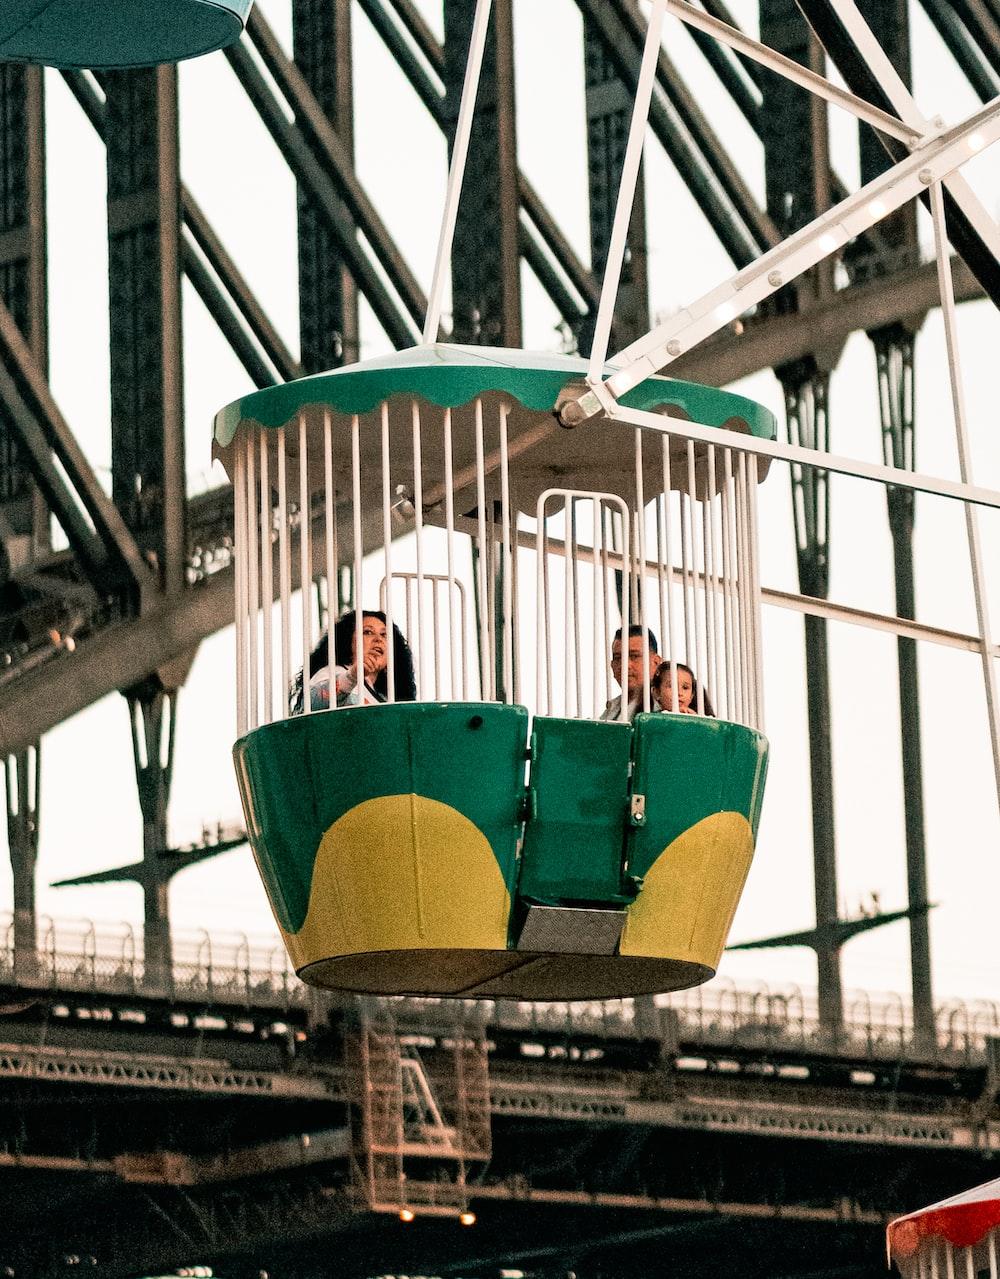 three person riding Ferris wheel